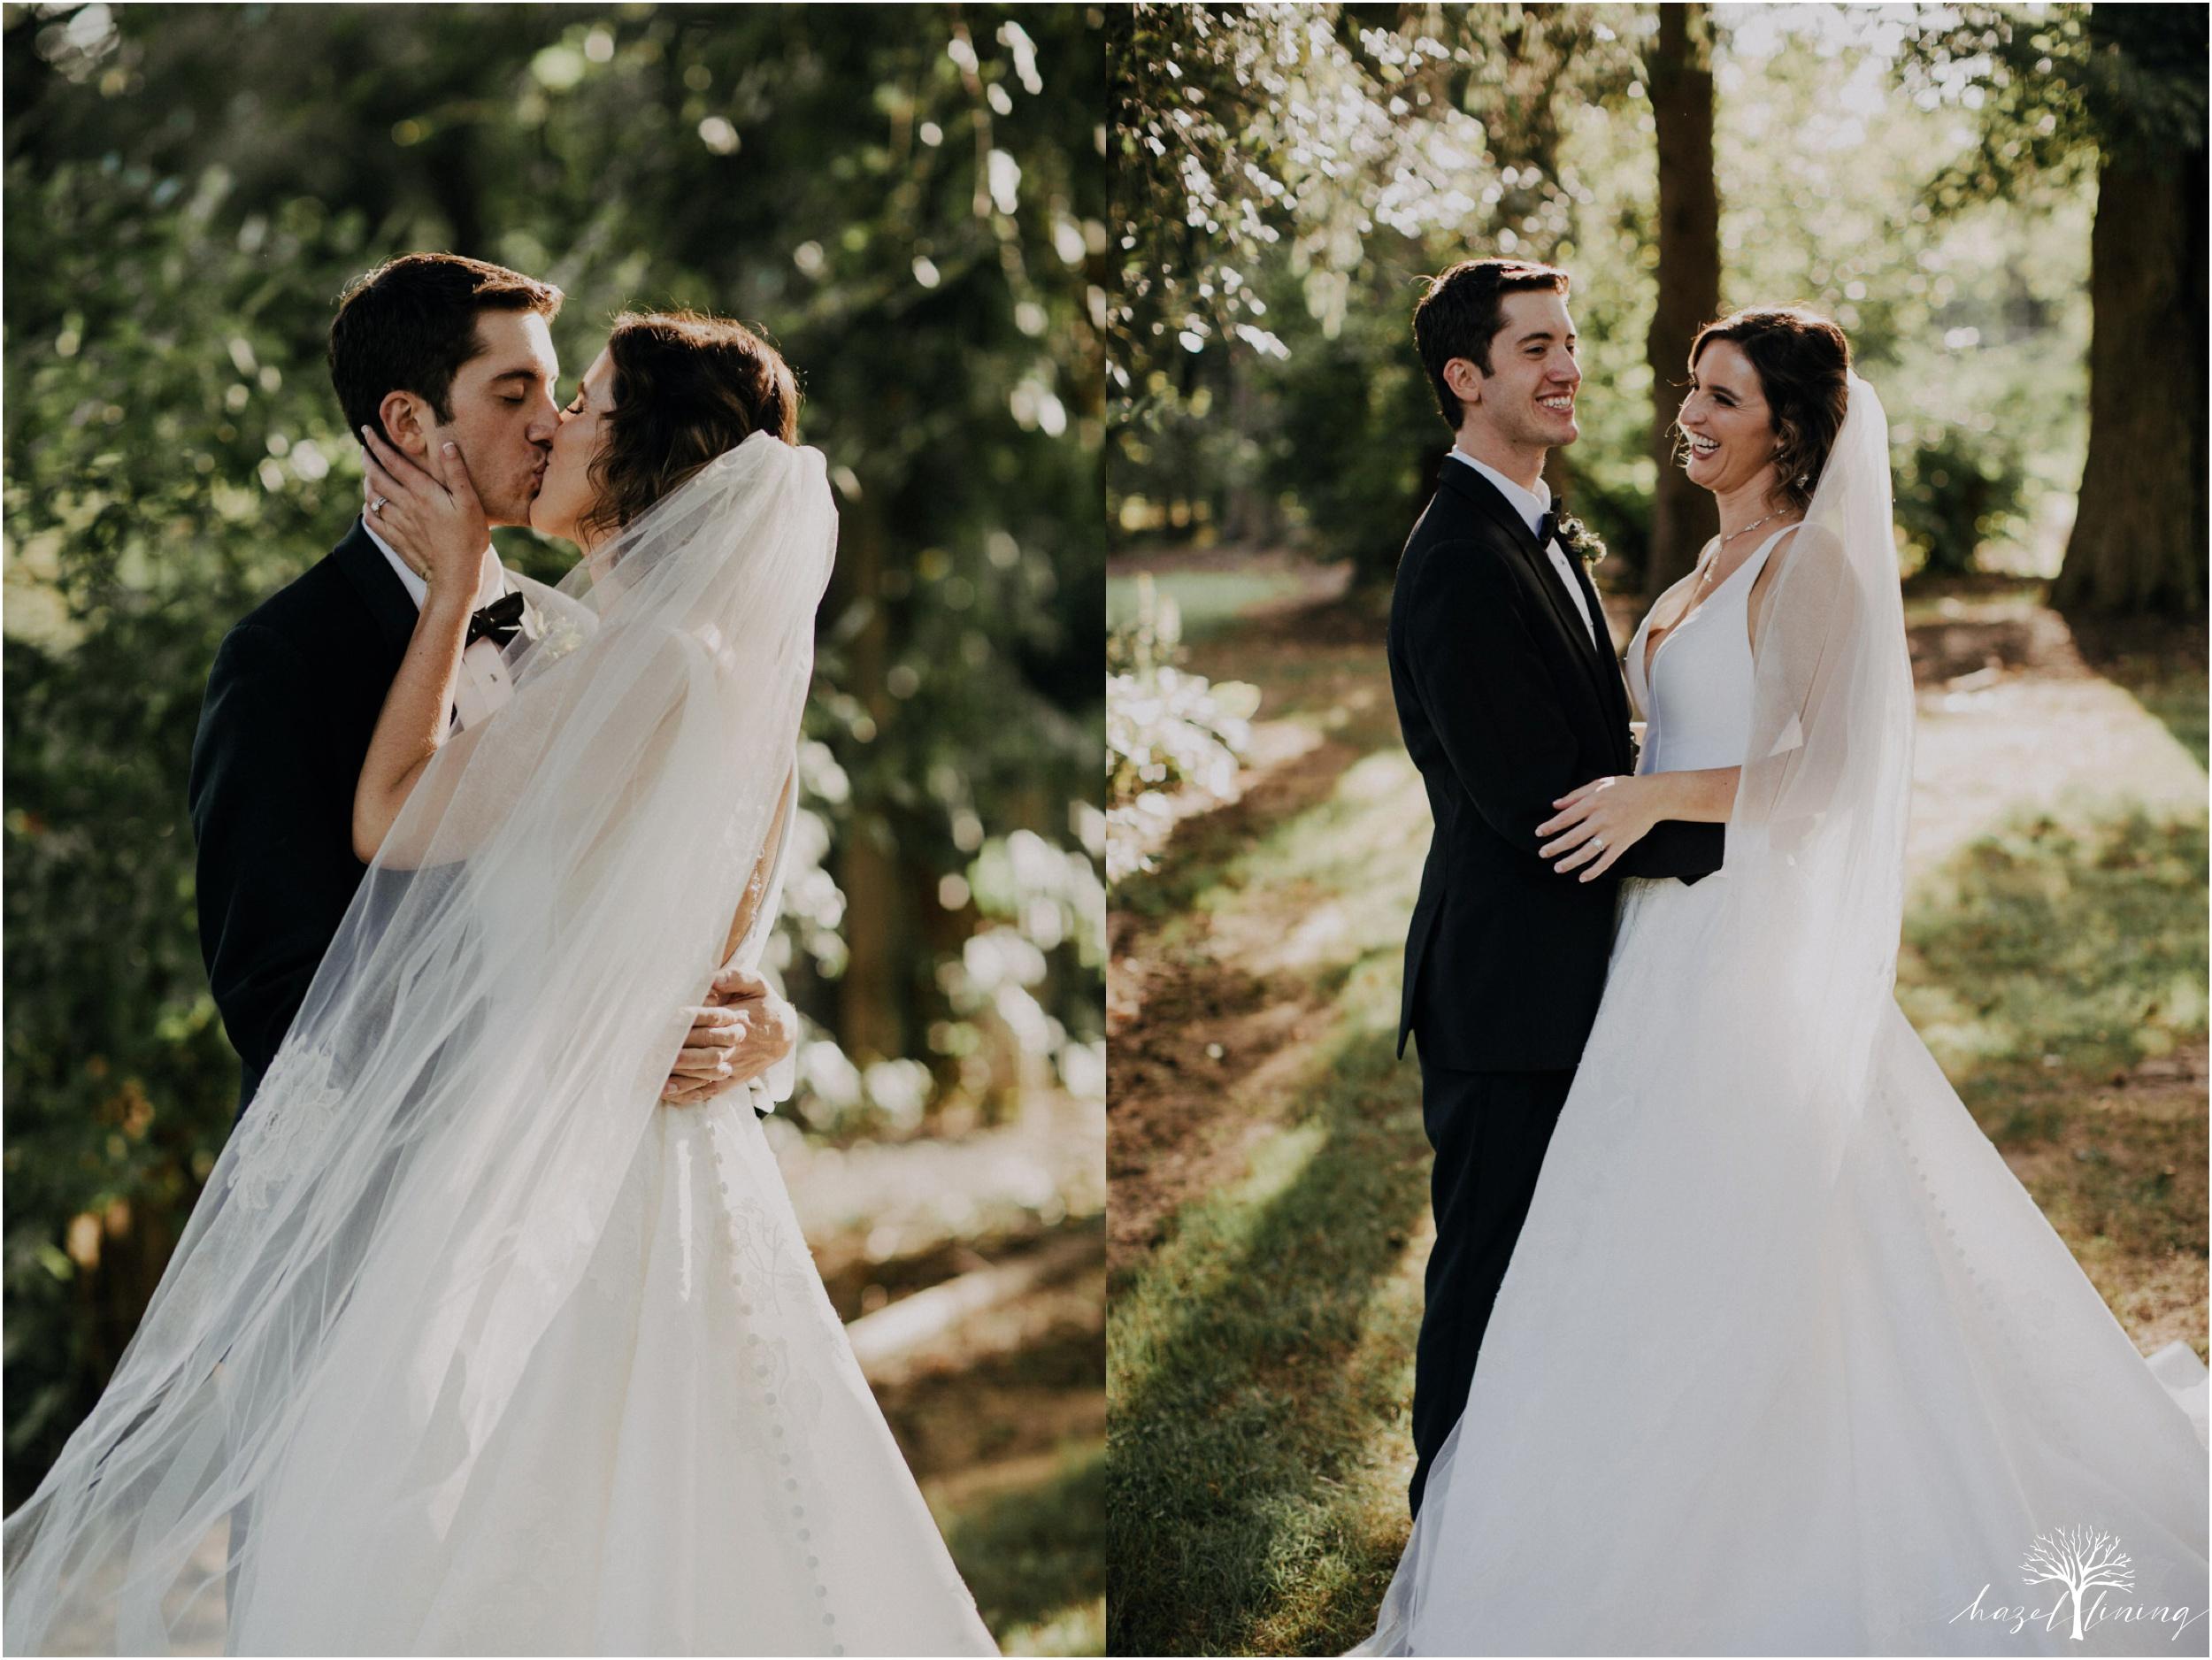 maureen-hepner-anthony-giordano-rose-bank-winery-newtow-pennsylvania-luxury-summer-wedding-hazel-lining-photography-destination-elopement-wedding-engagement-photography_0121.jpg